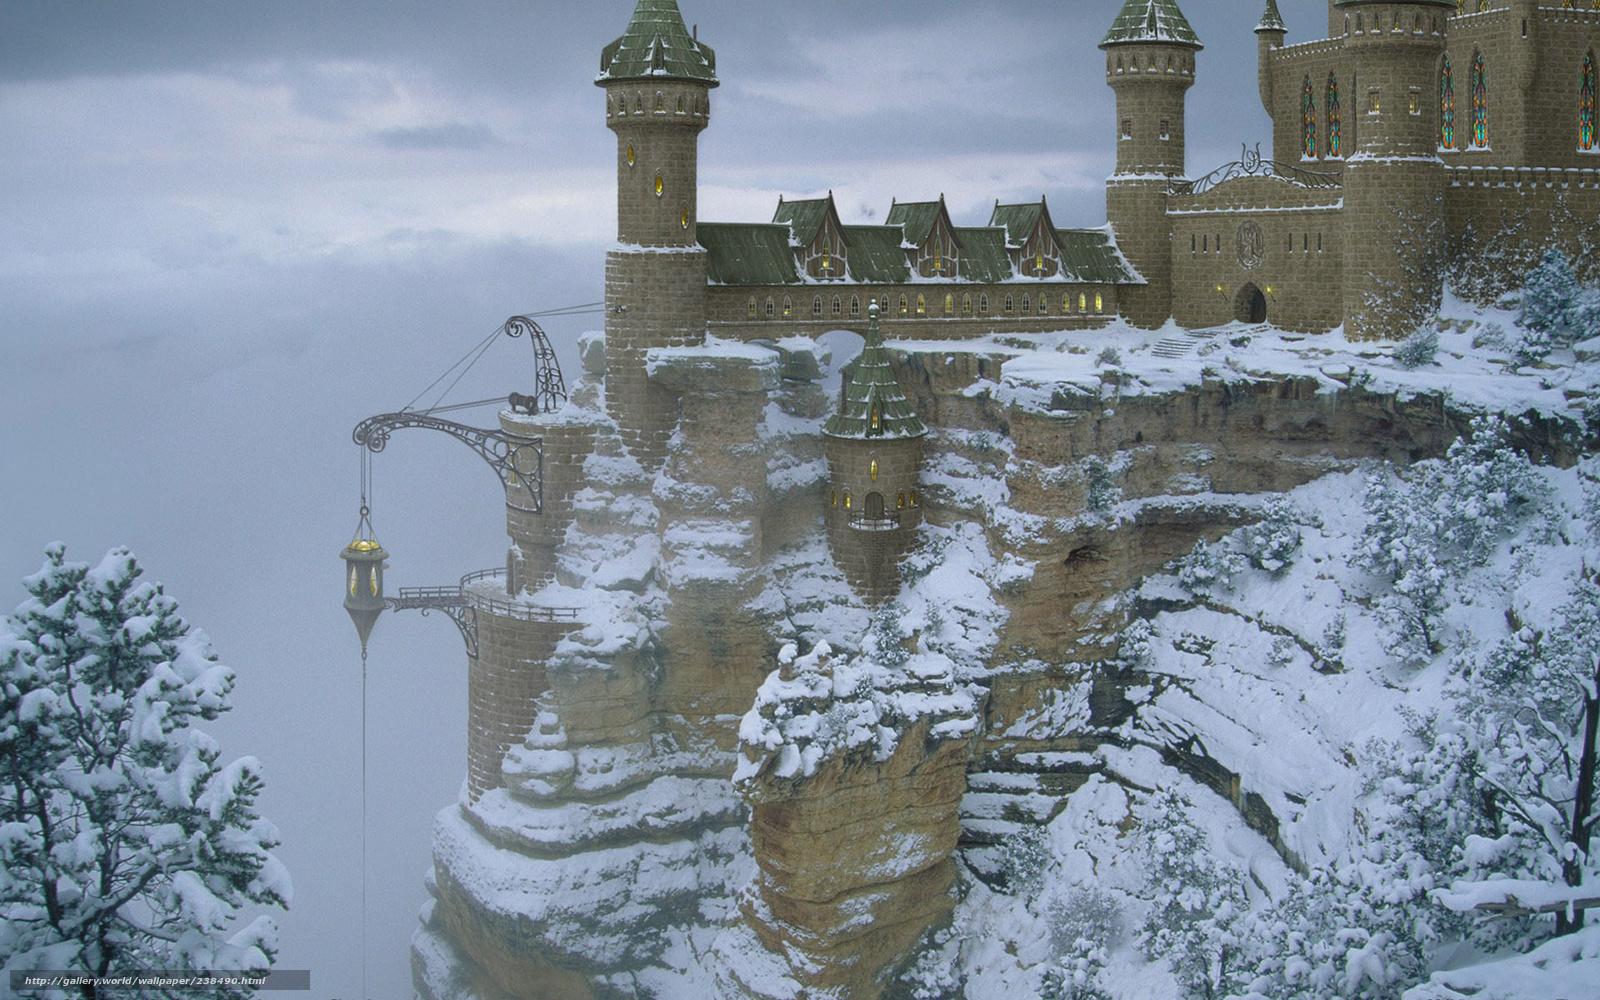 Hogwarts Castle Desktop Wallpaper The Original File is Available